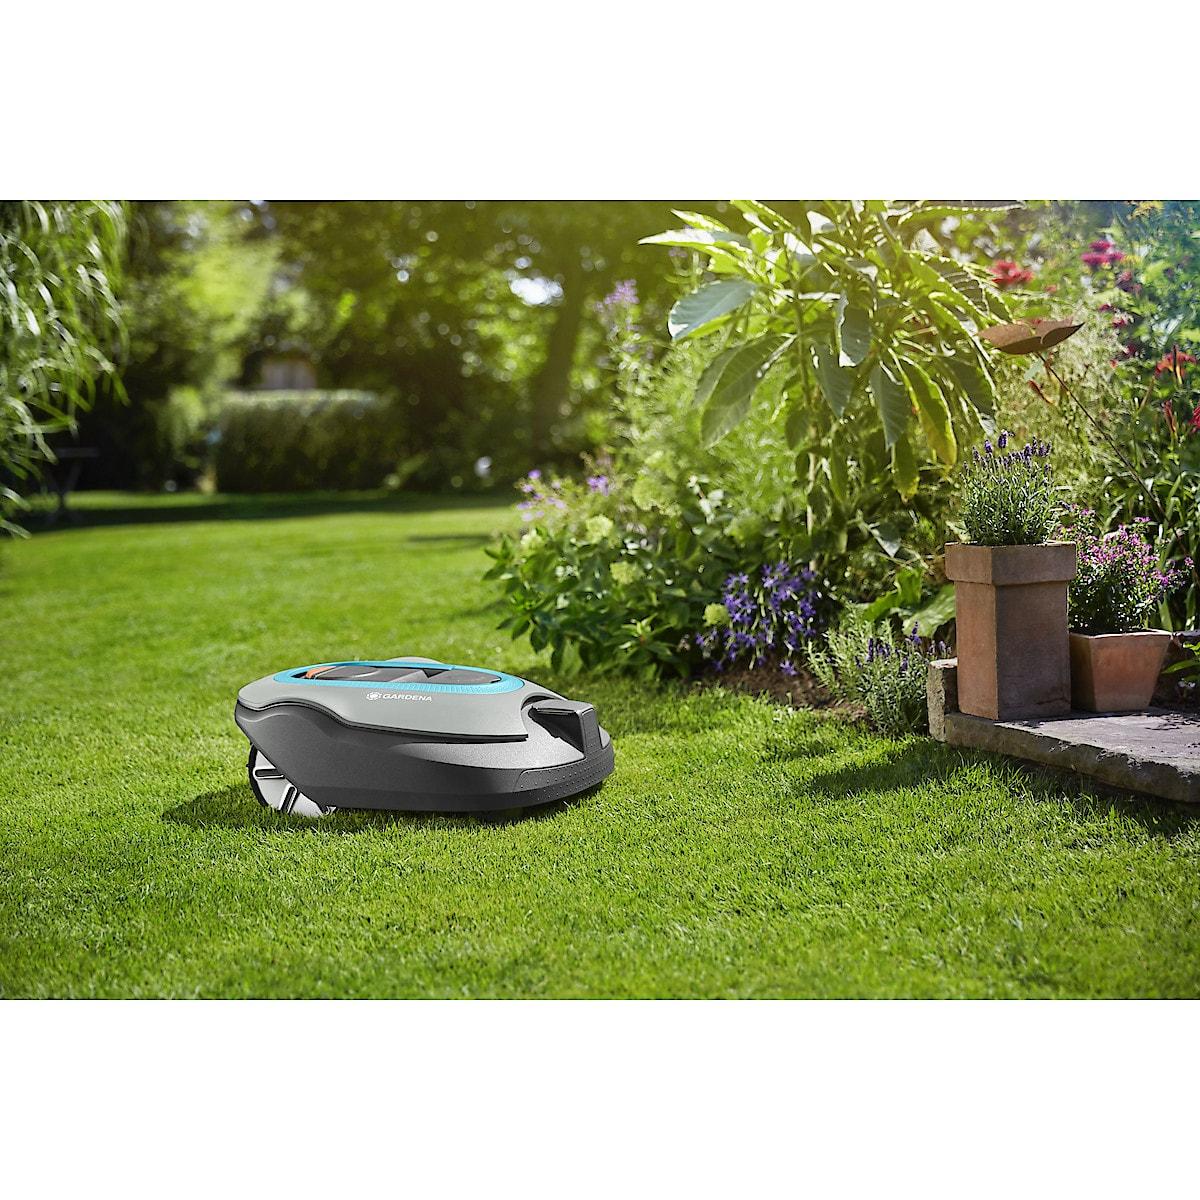 Gardena Sileno+ R130LI robotgressklipper